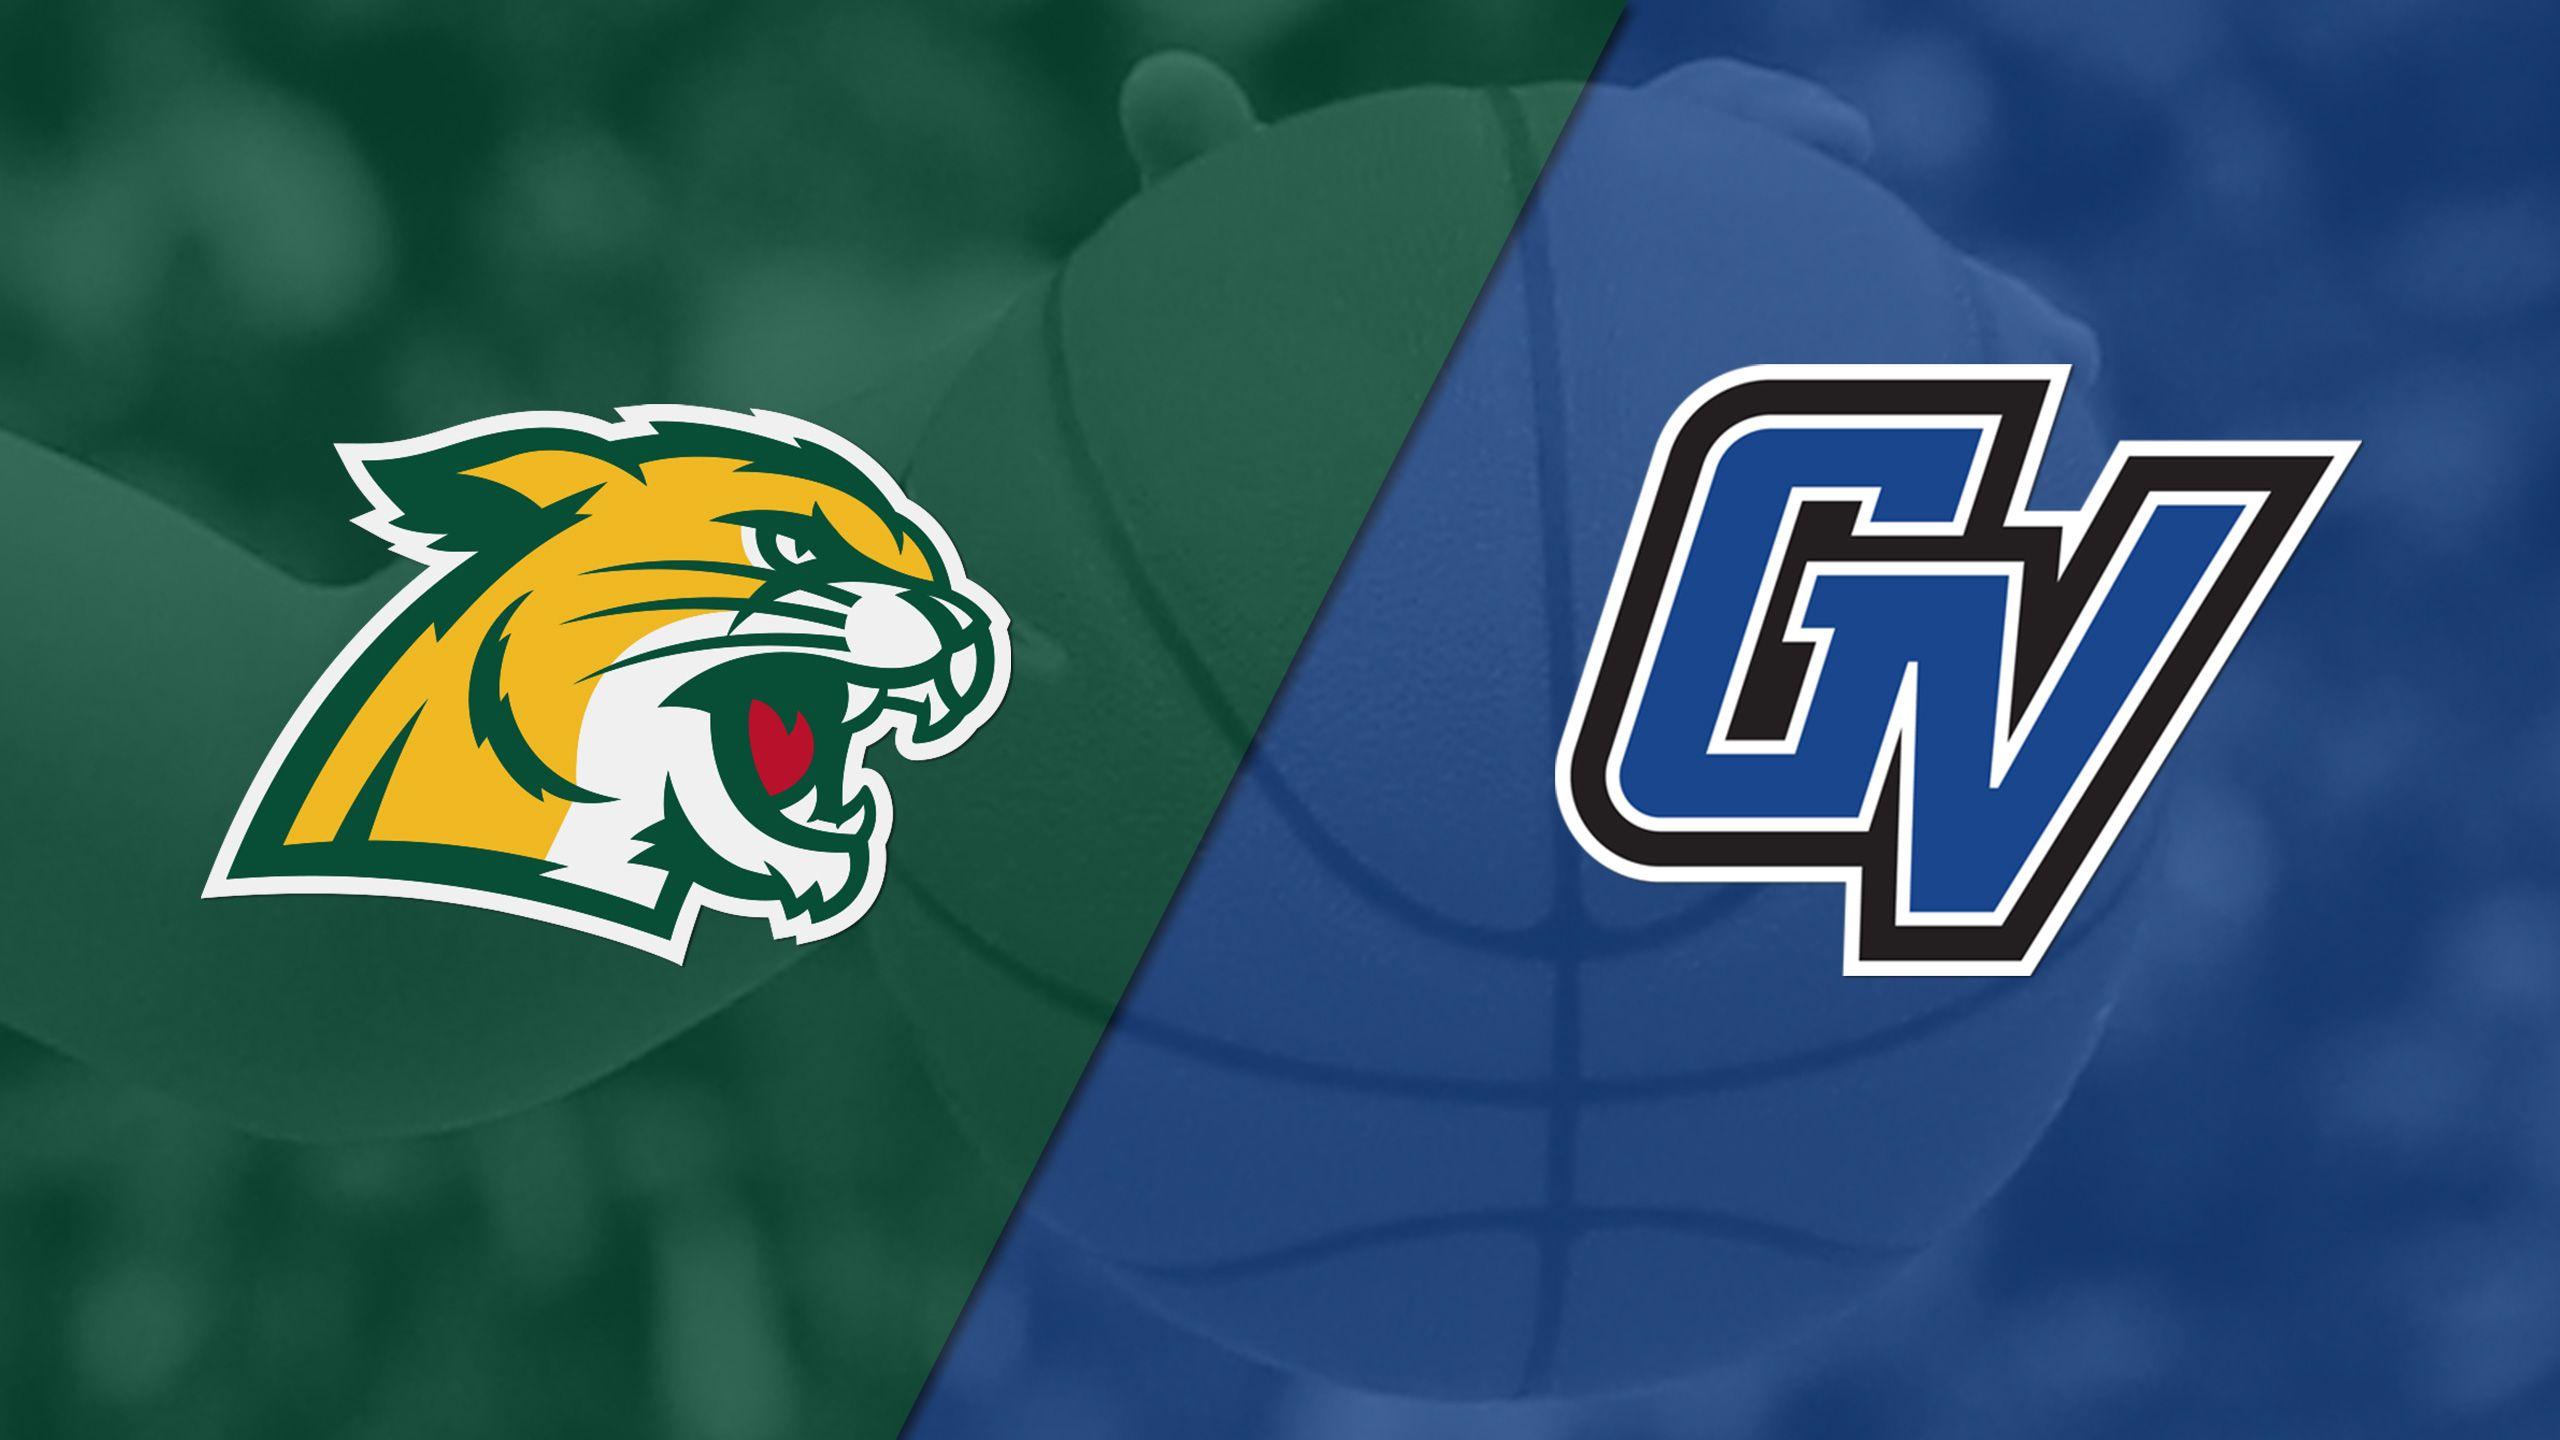 Northern Michigan vs. Grand Valley State (W Basketball)